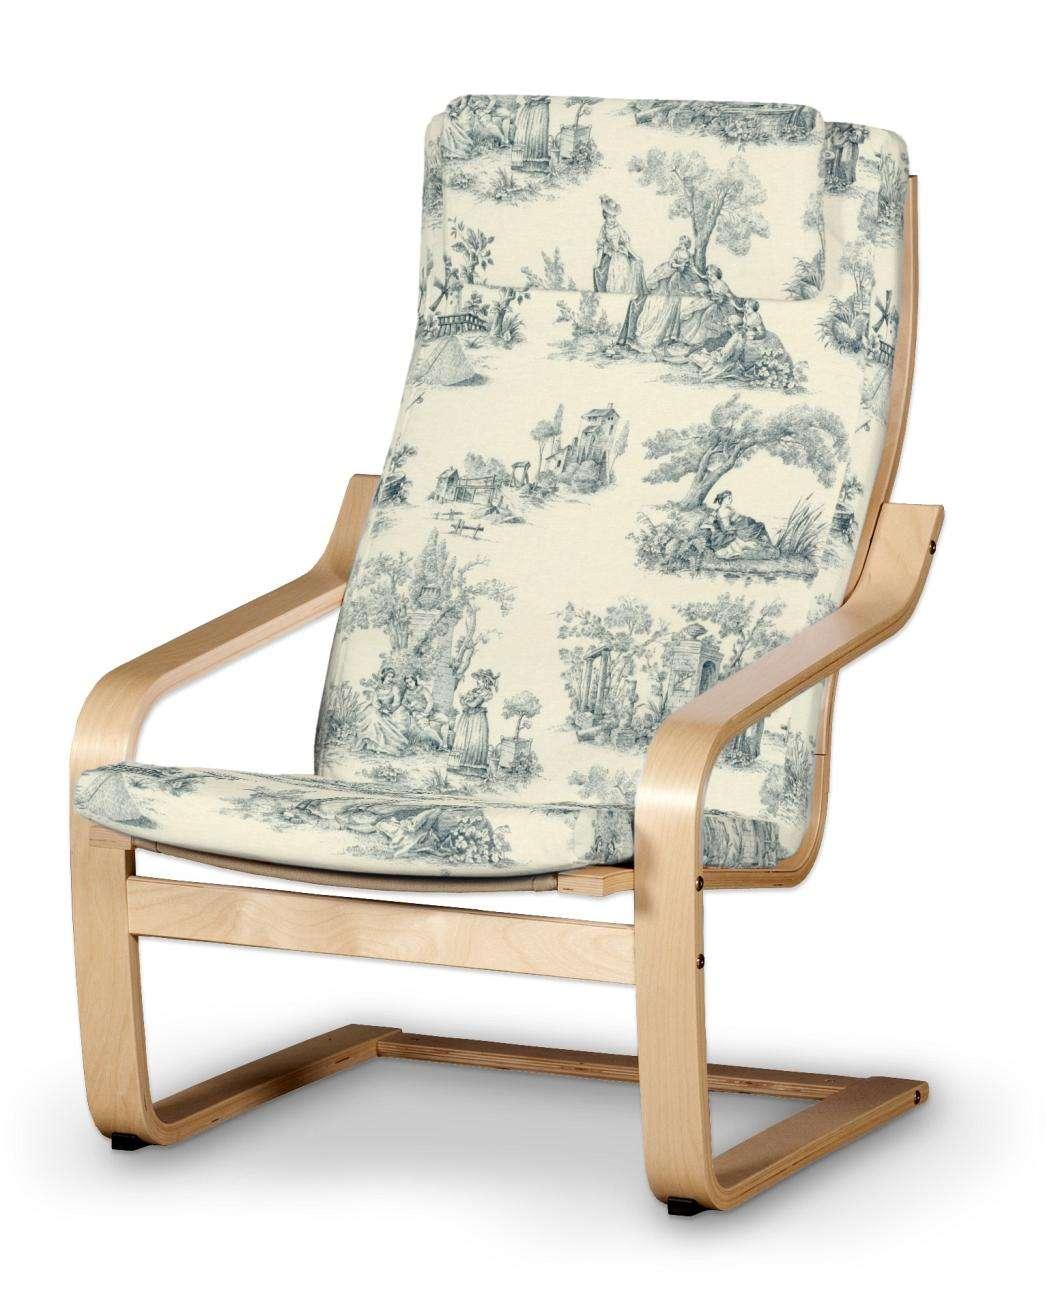 Poduszka na fotel Poäng II Fotel Poäng II w kolekcji Avinon, tkanina: 132-66